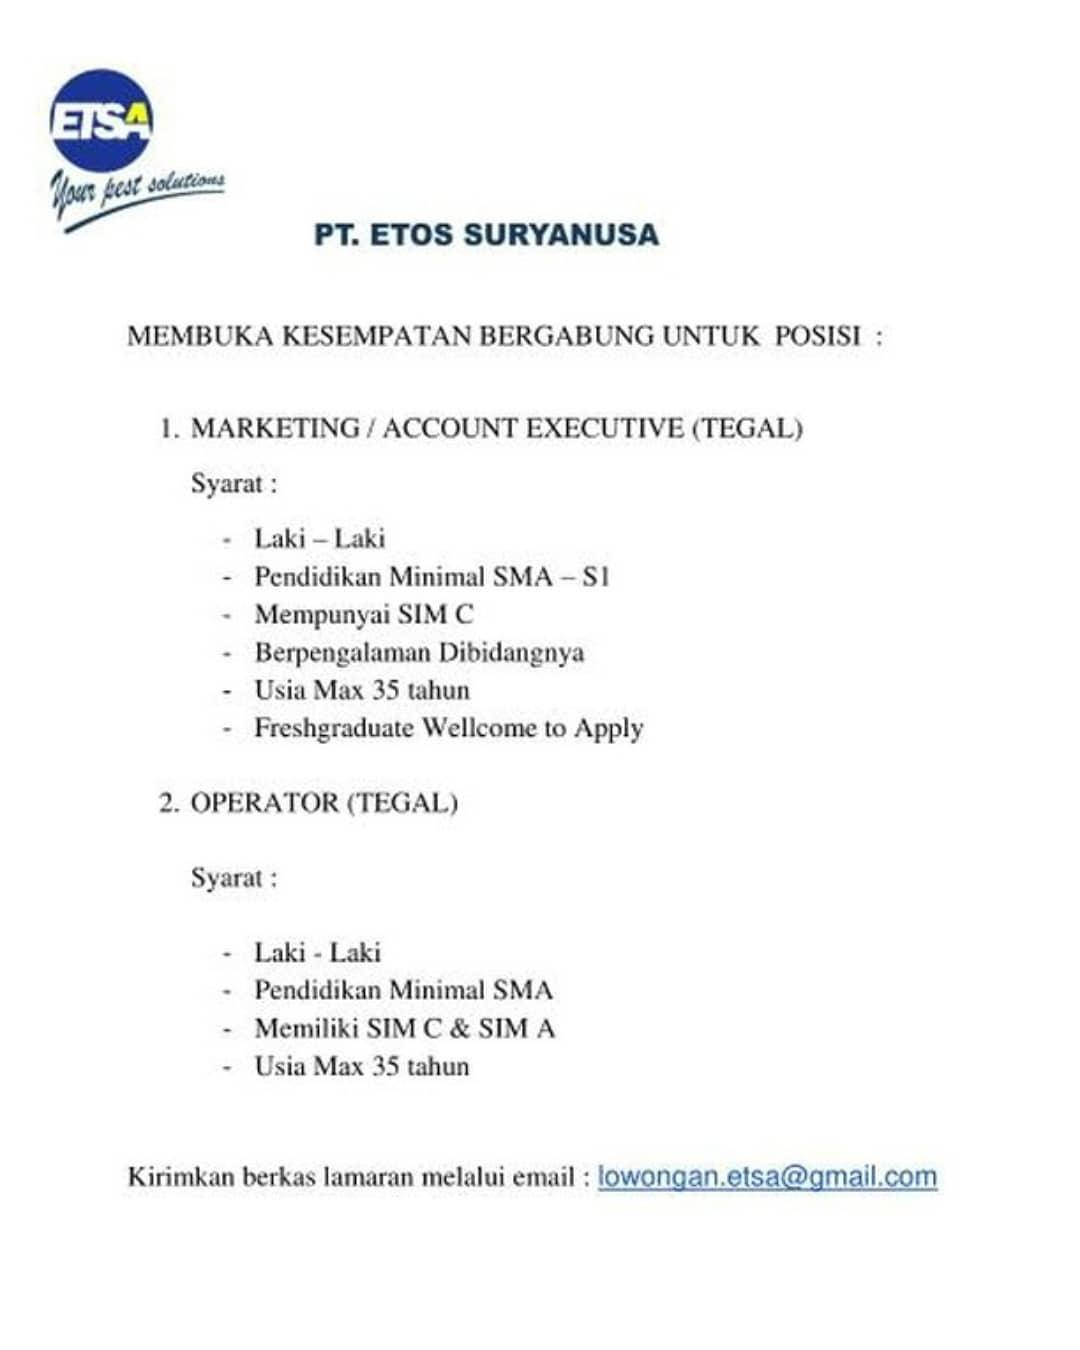 PT. Etos Suryanusa